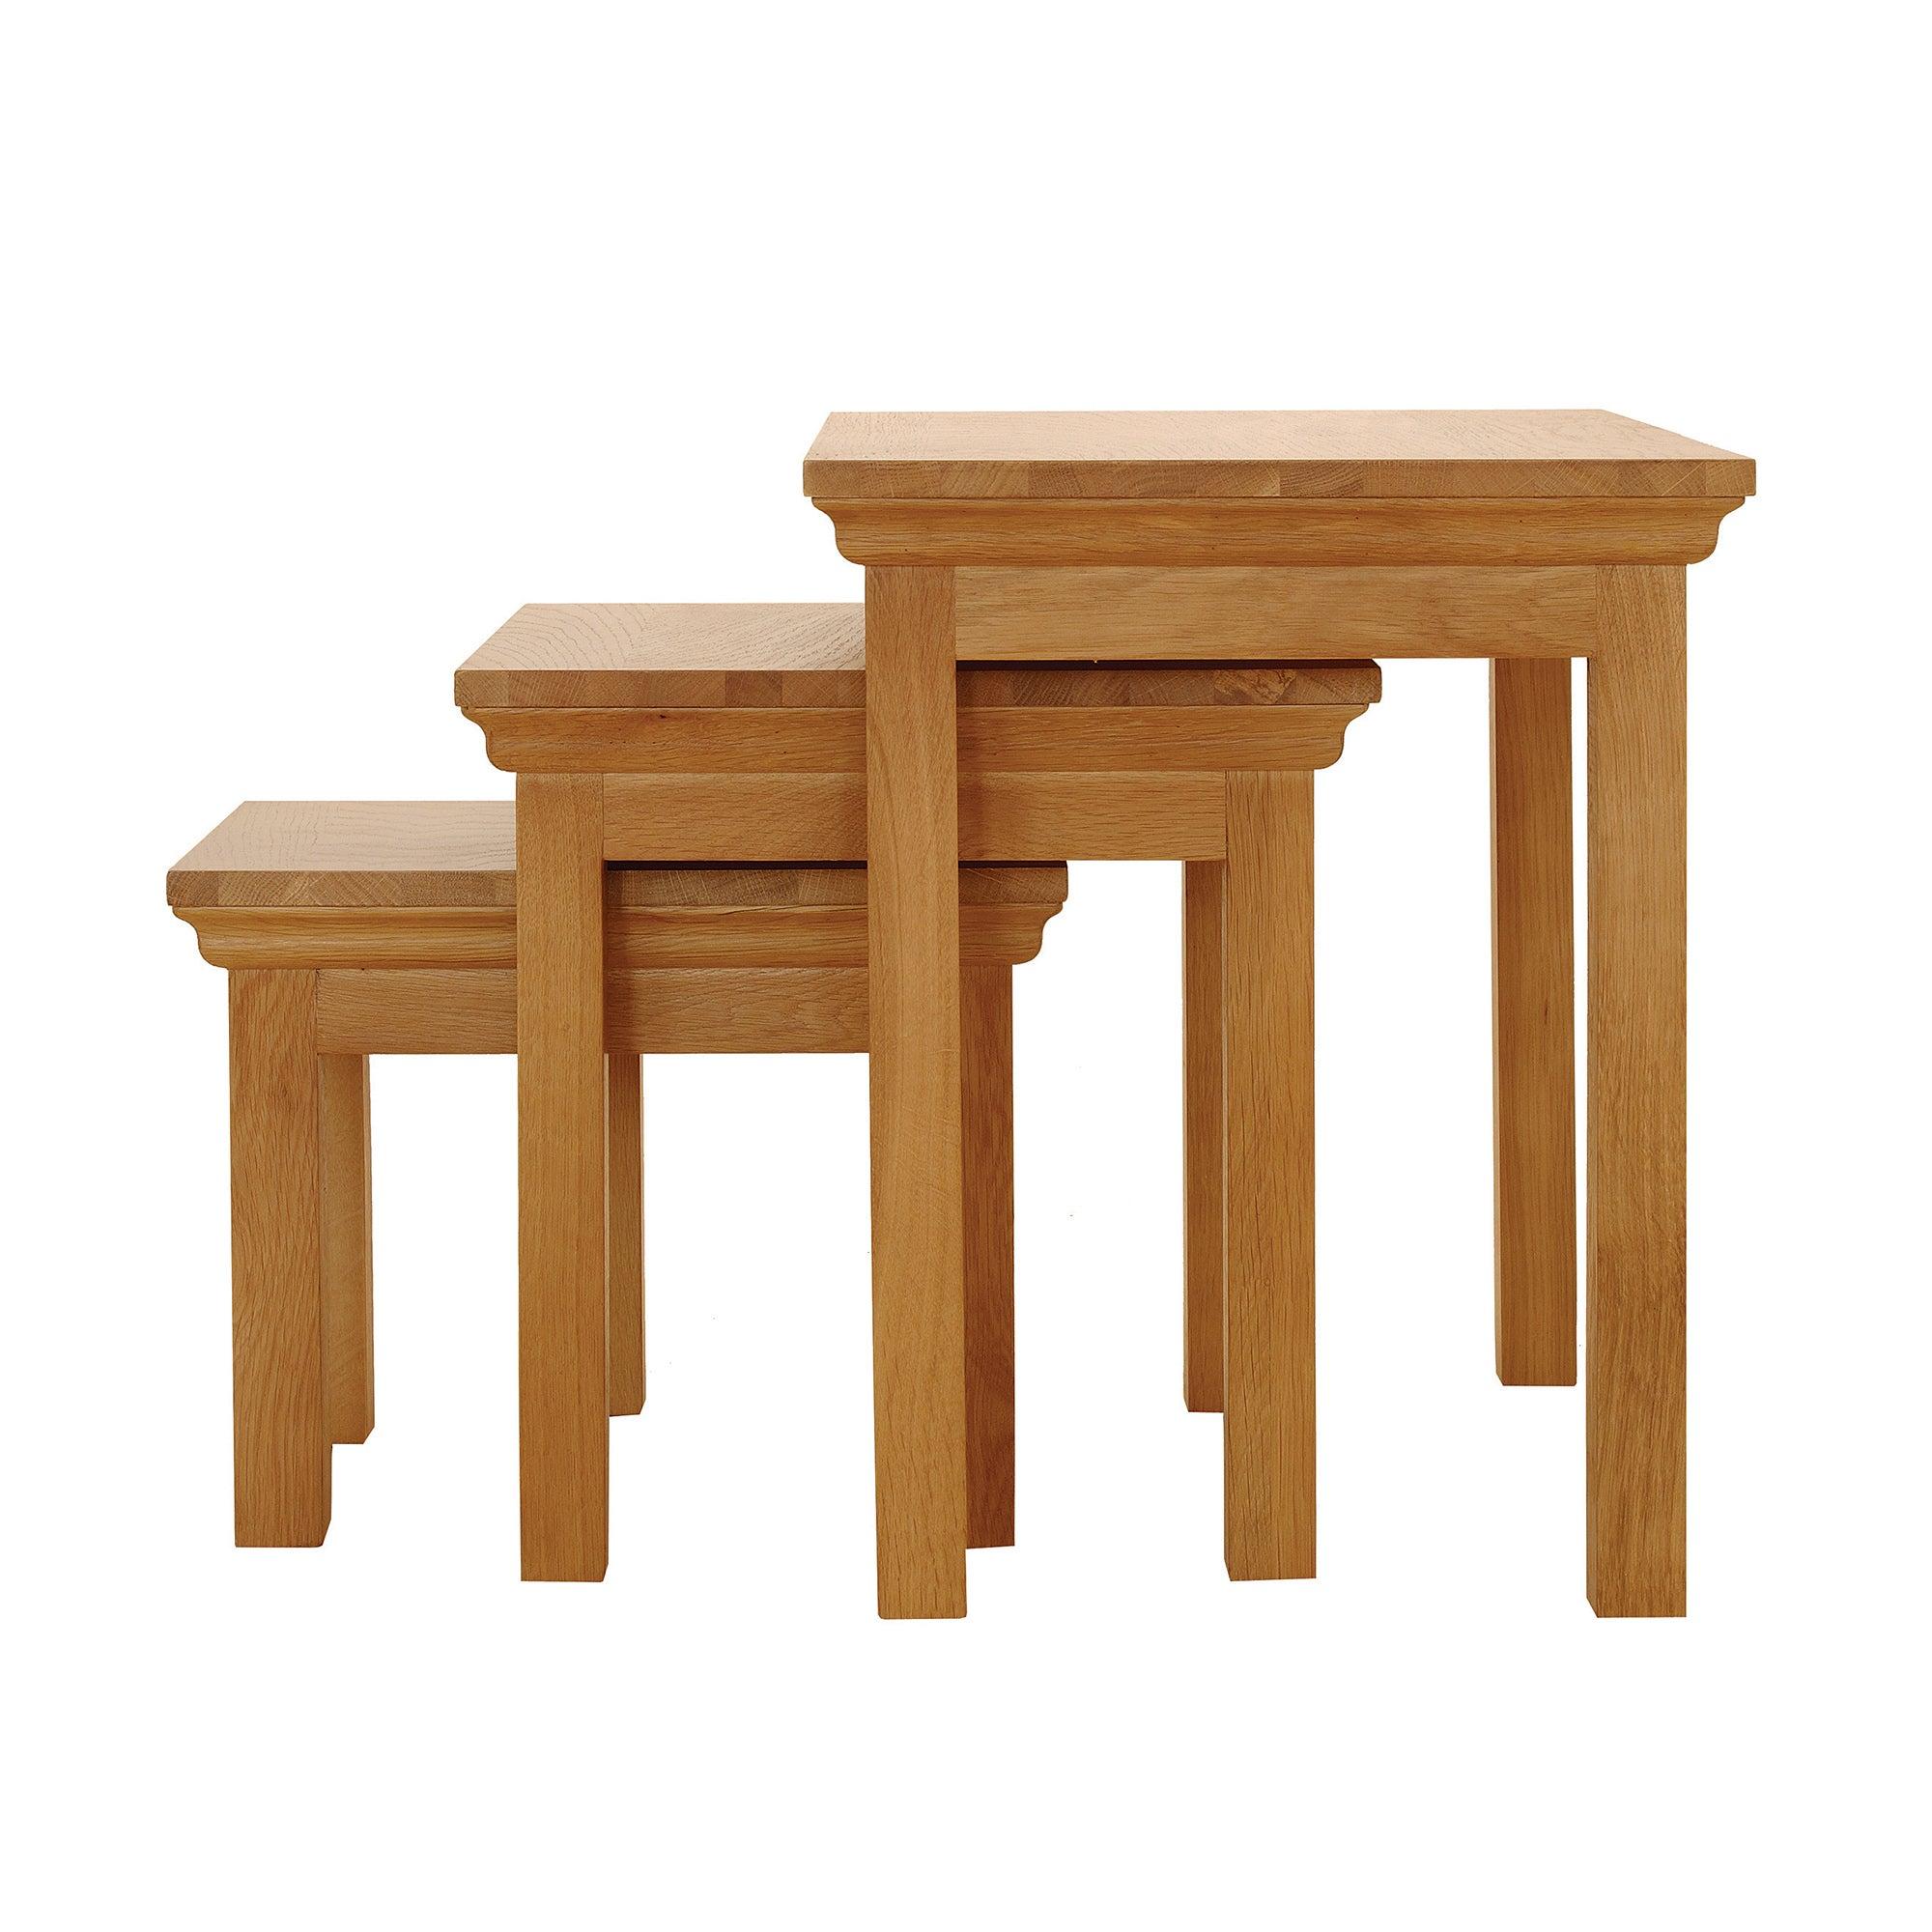 light oak nest of tables shop for cheap tables and save. Black Bedroom Furniture Sets. Home Design Ideas